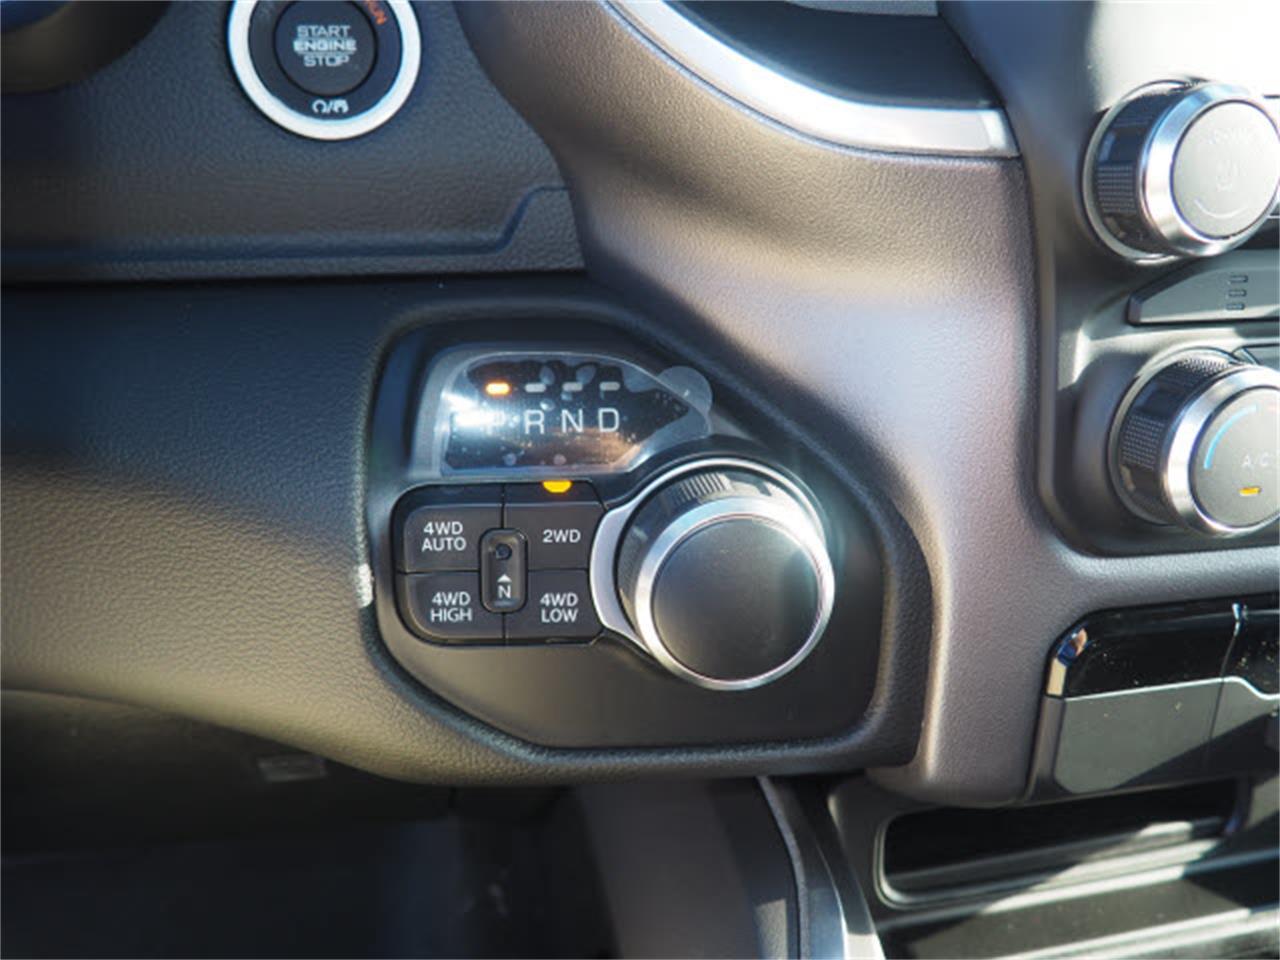 2020 Dodge Ram 1500 (CC-1327532) for sale in Marysville, Ohio